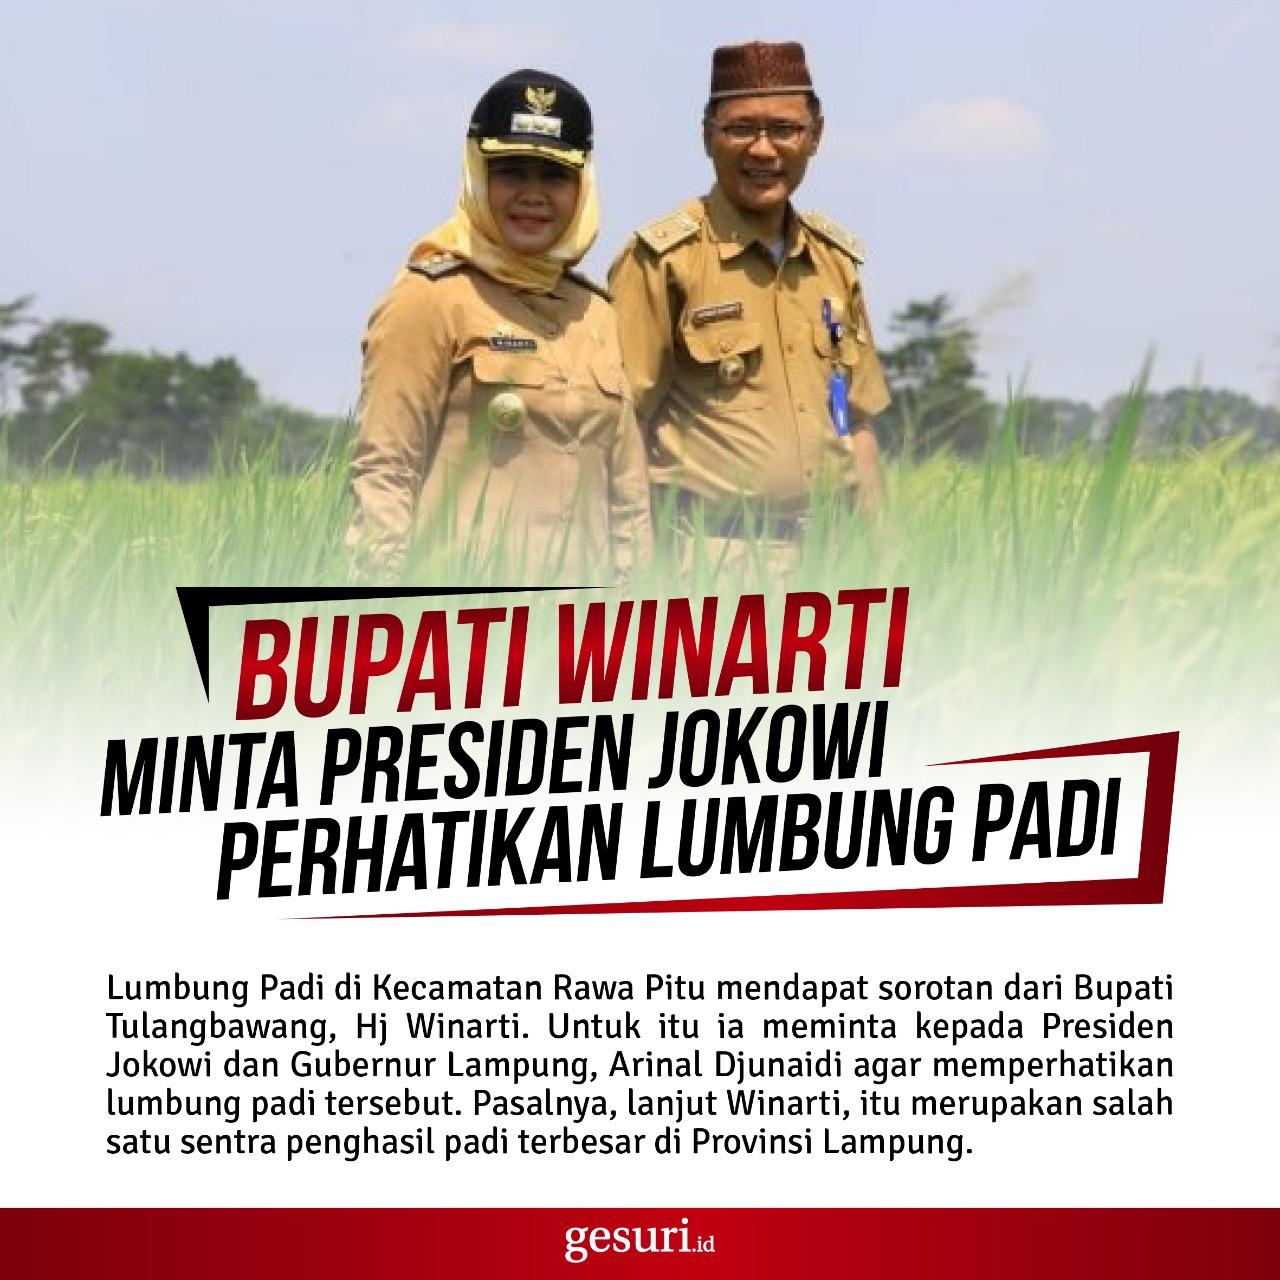 Bupati Winarti Minta Presiden Jokowi Perhatikan Lumbung Padi